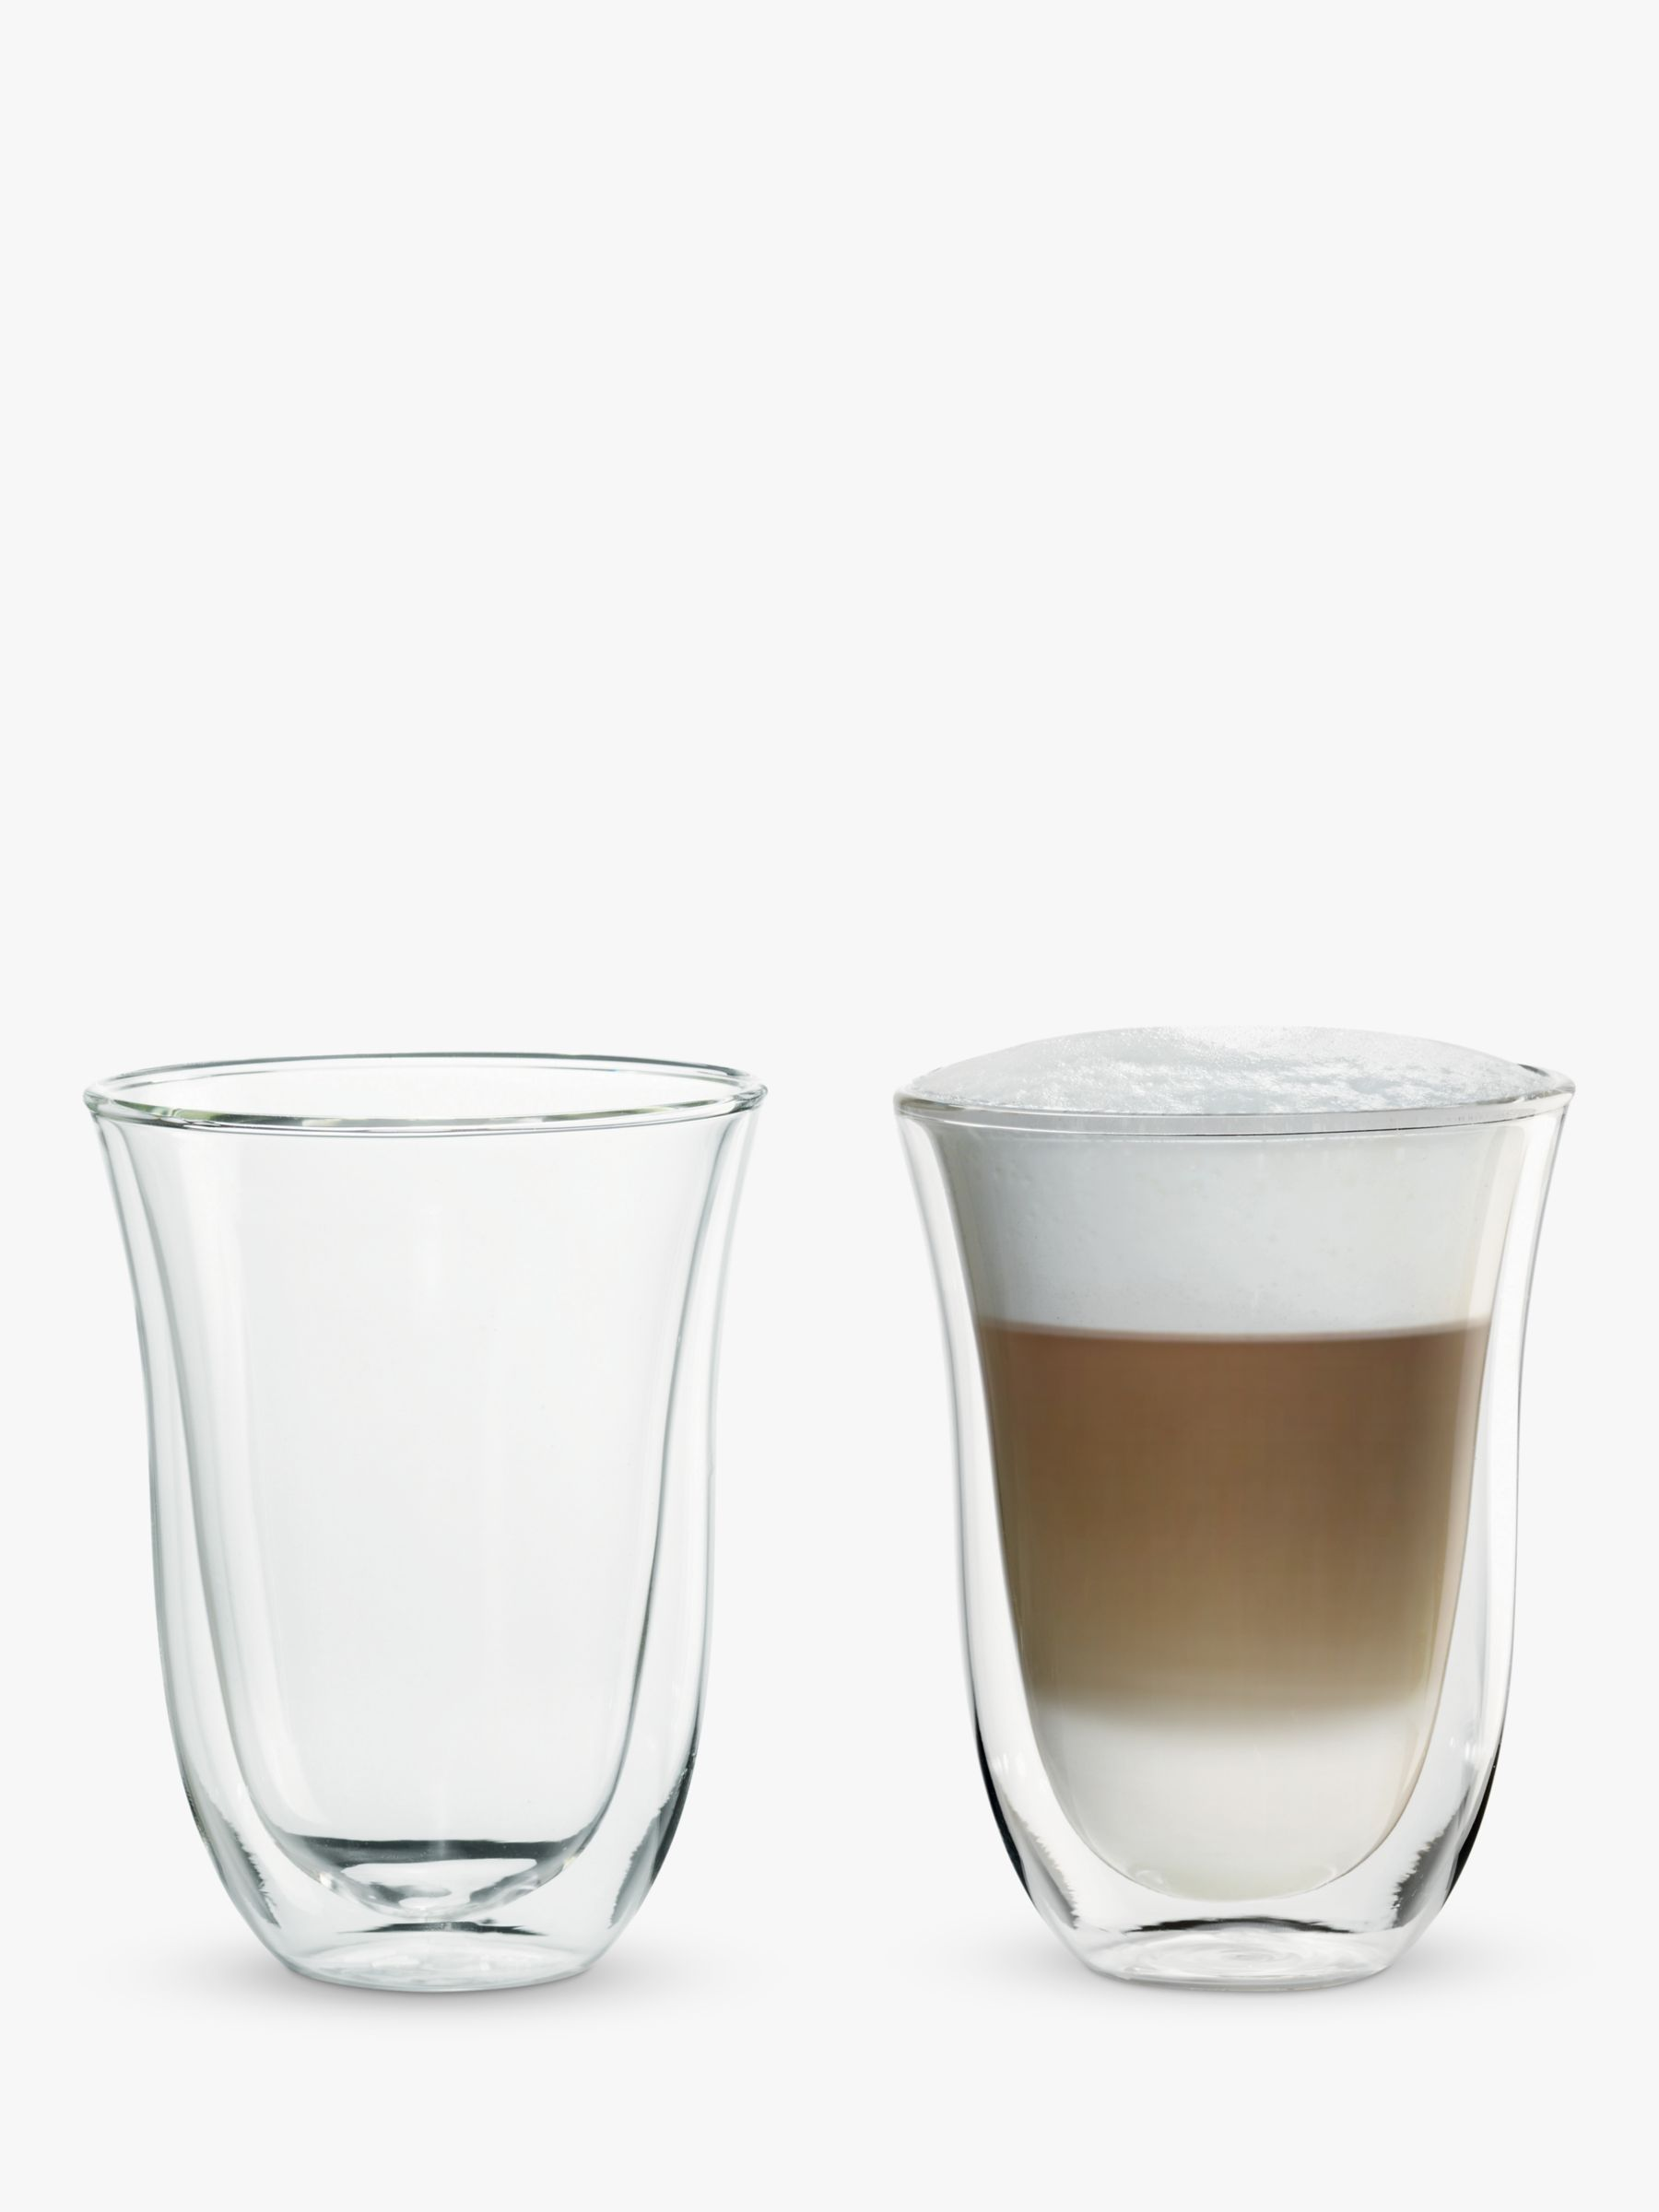 De'Longhi Latte Macchiato Glasses, Set of 2 #lattemacchiato